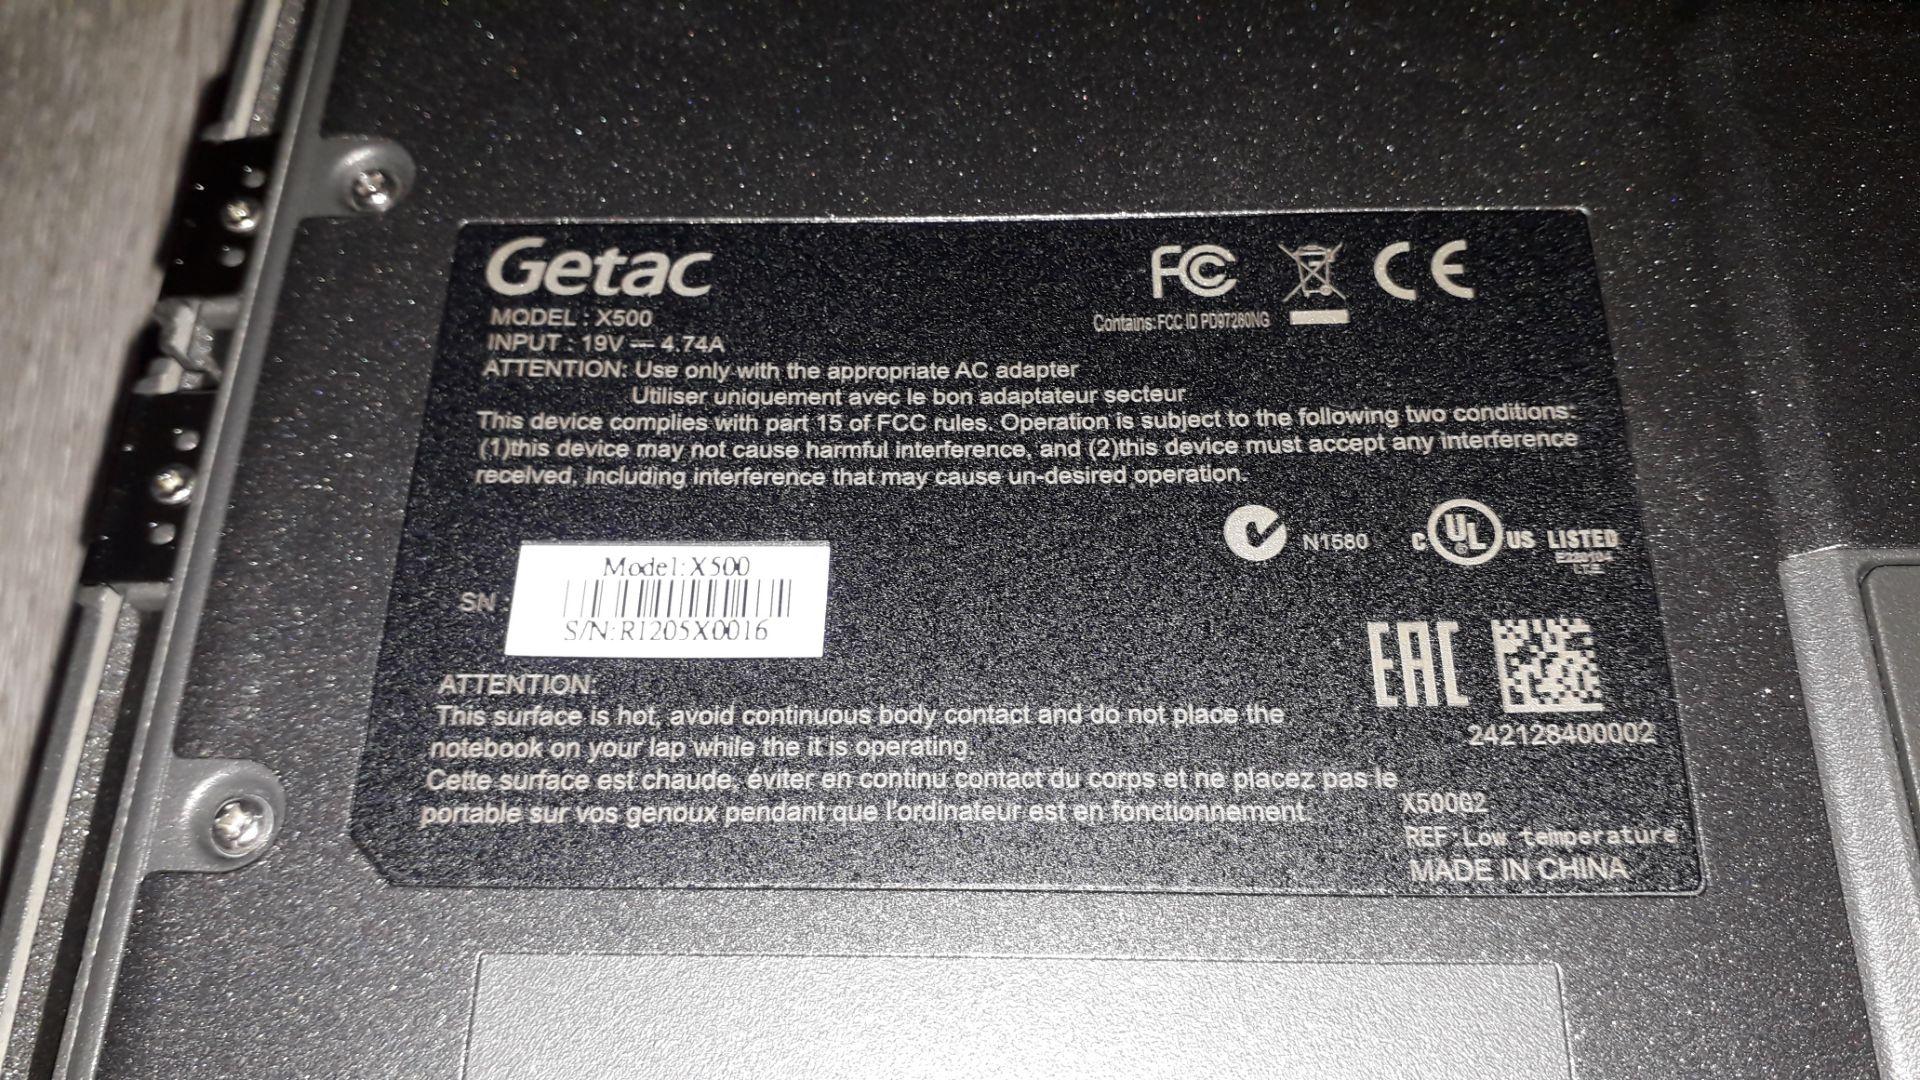 Getac X500 G2 Core i7 8GB, 256GB HDD Ultra Rugged - Image 5 of 9